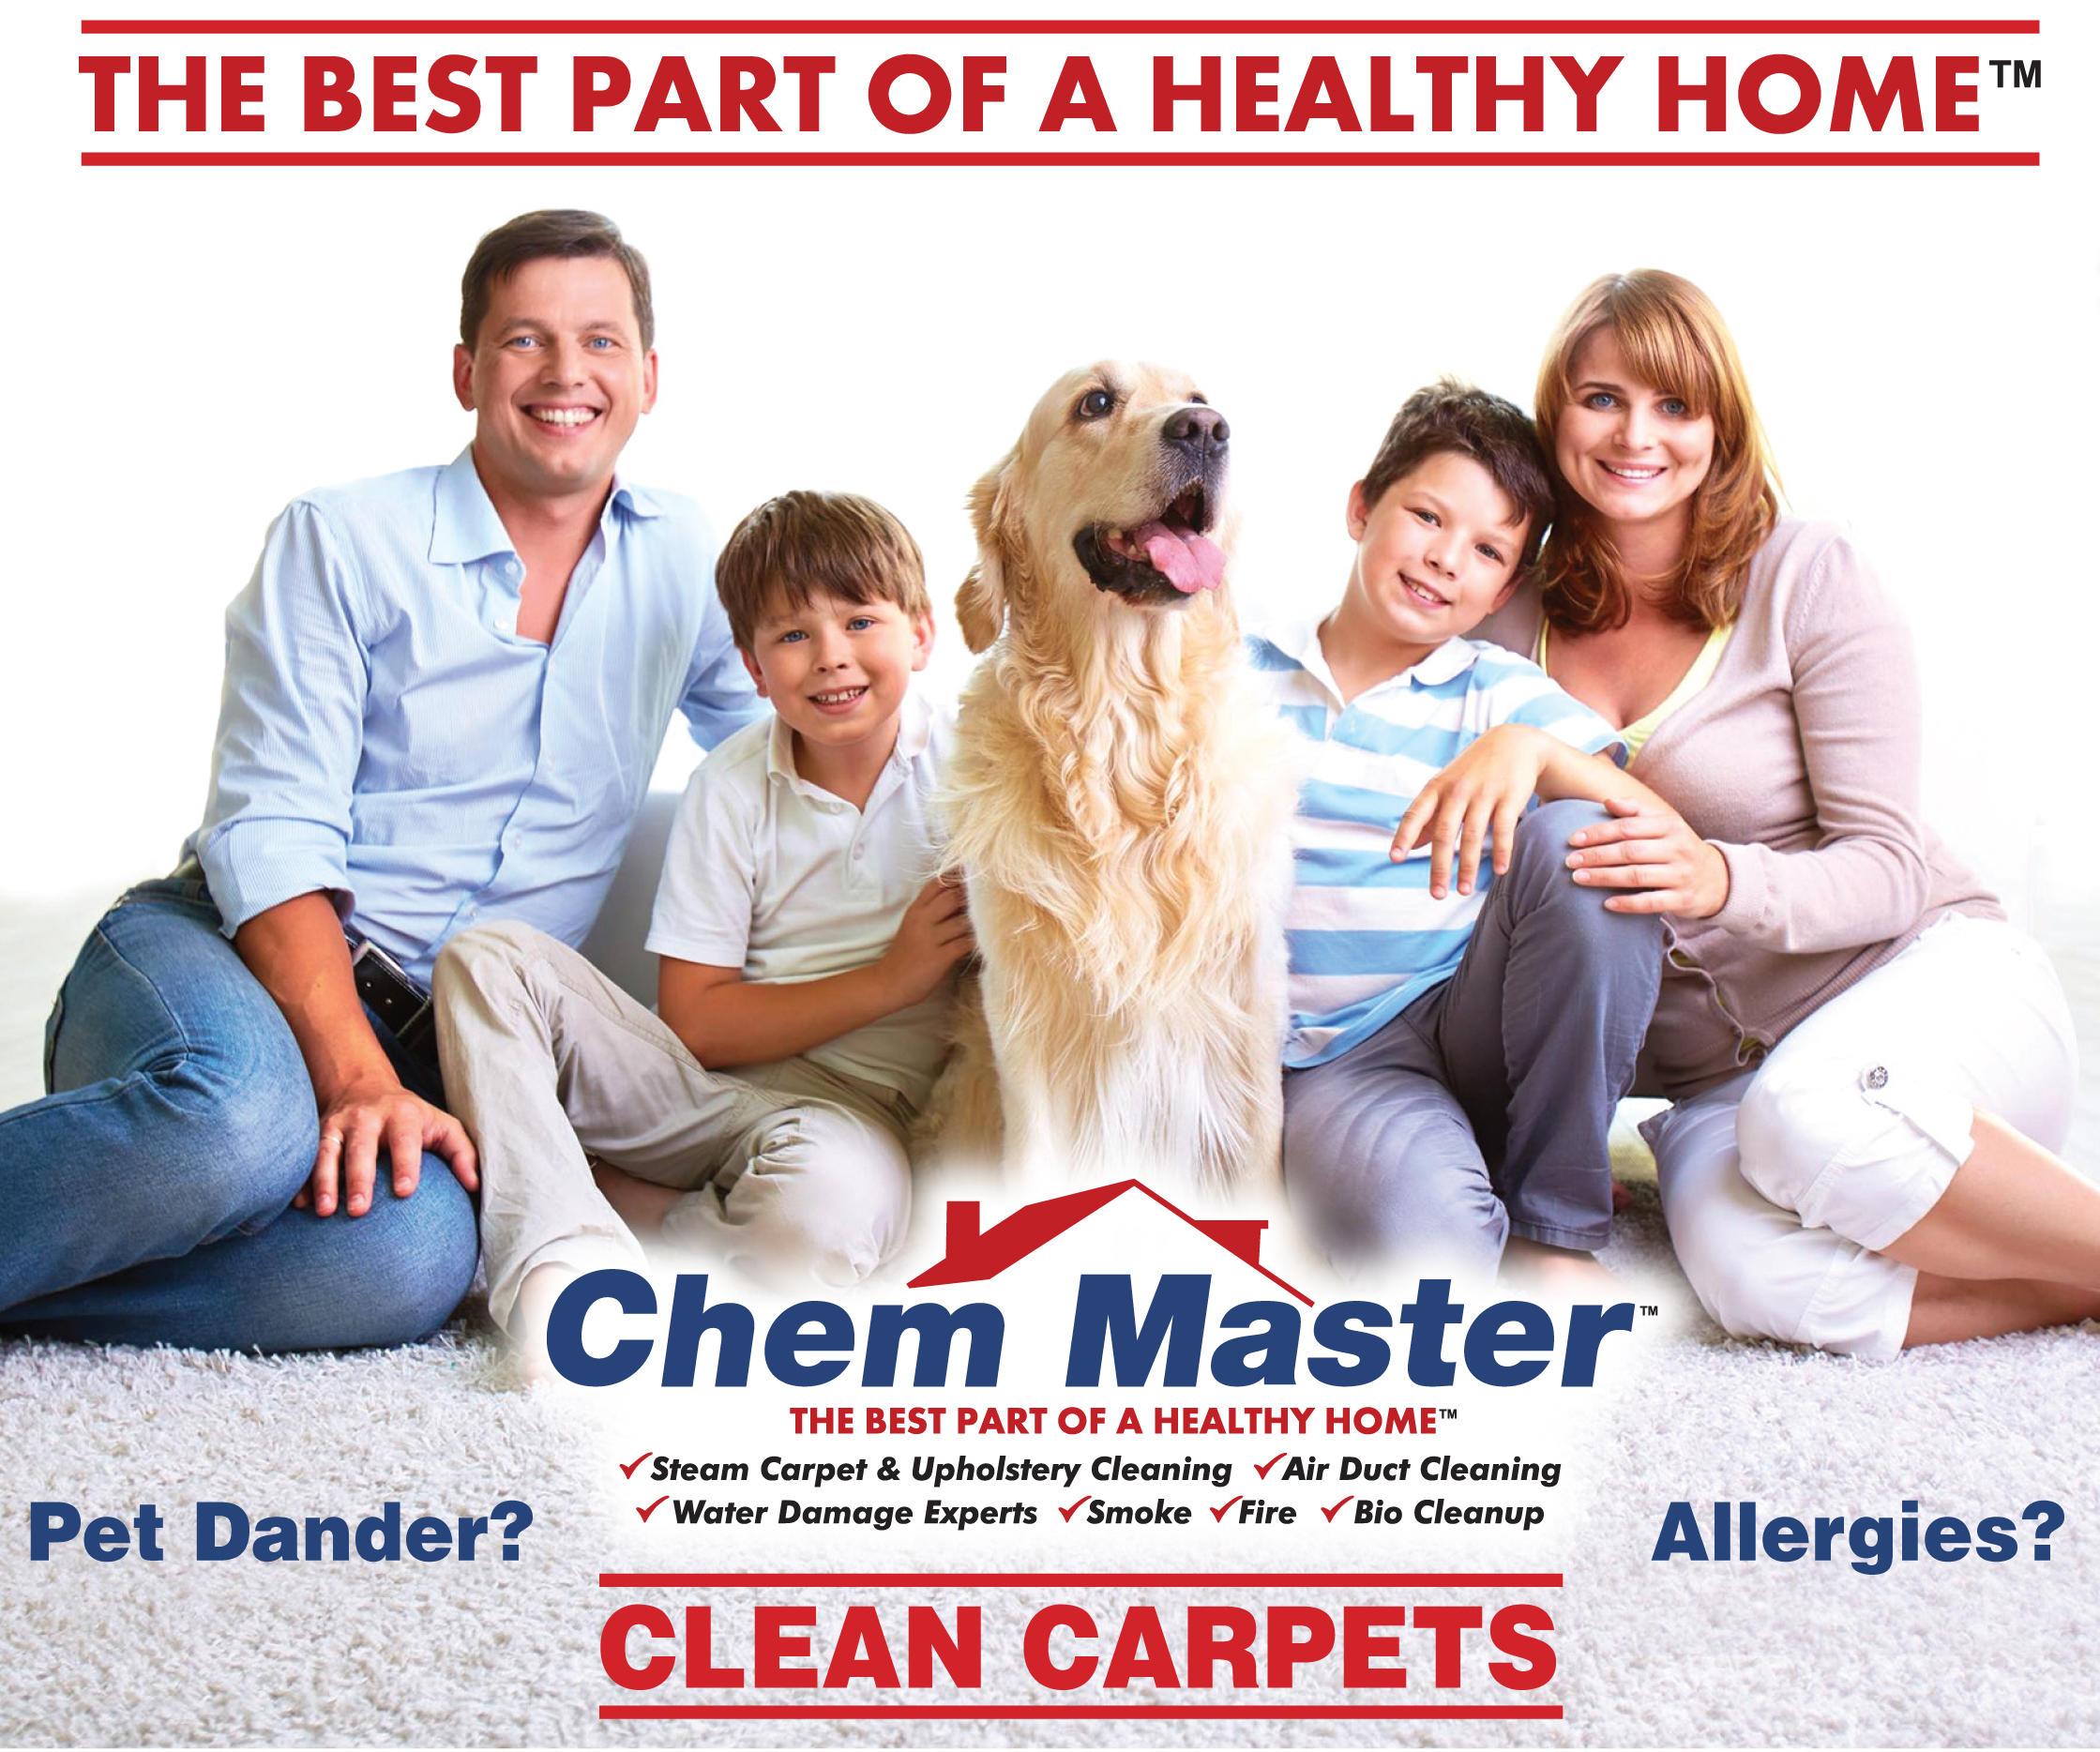 Chem Master Carpet Cleaning And Restoration image 1